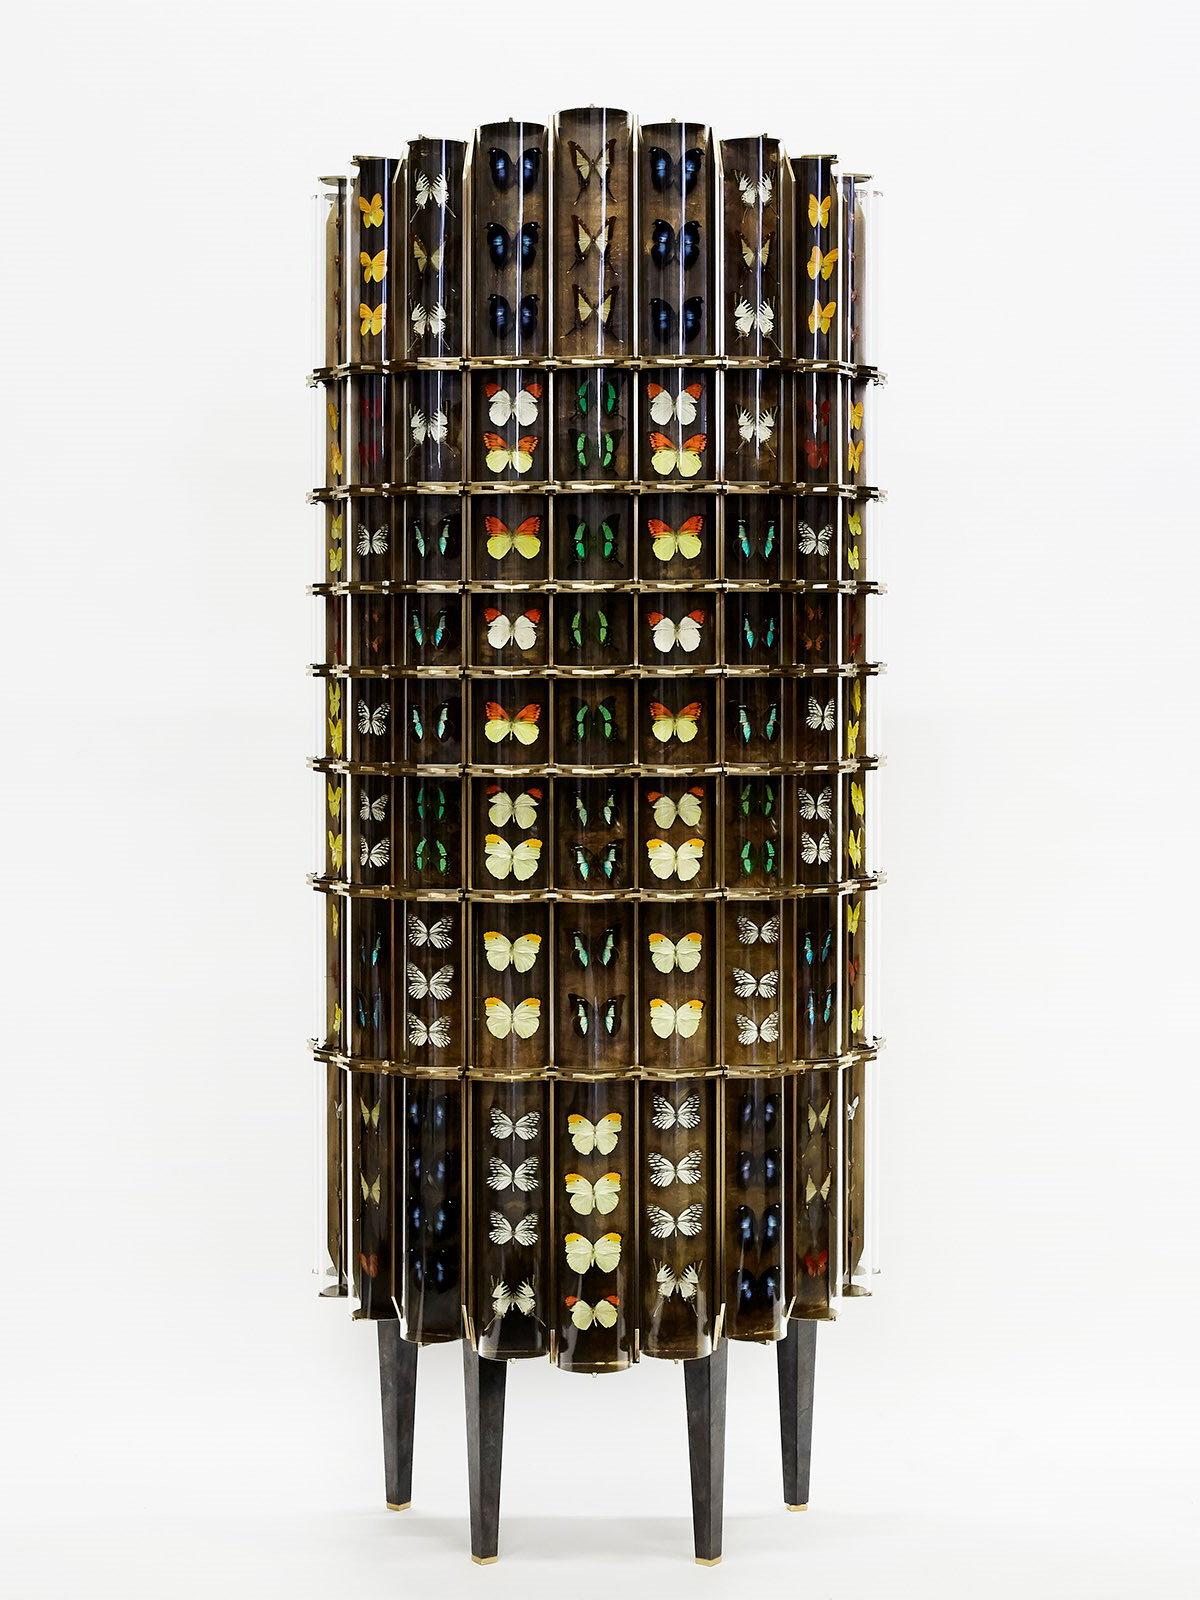 Cabinet de Curiosite by Erwan Boulloud